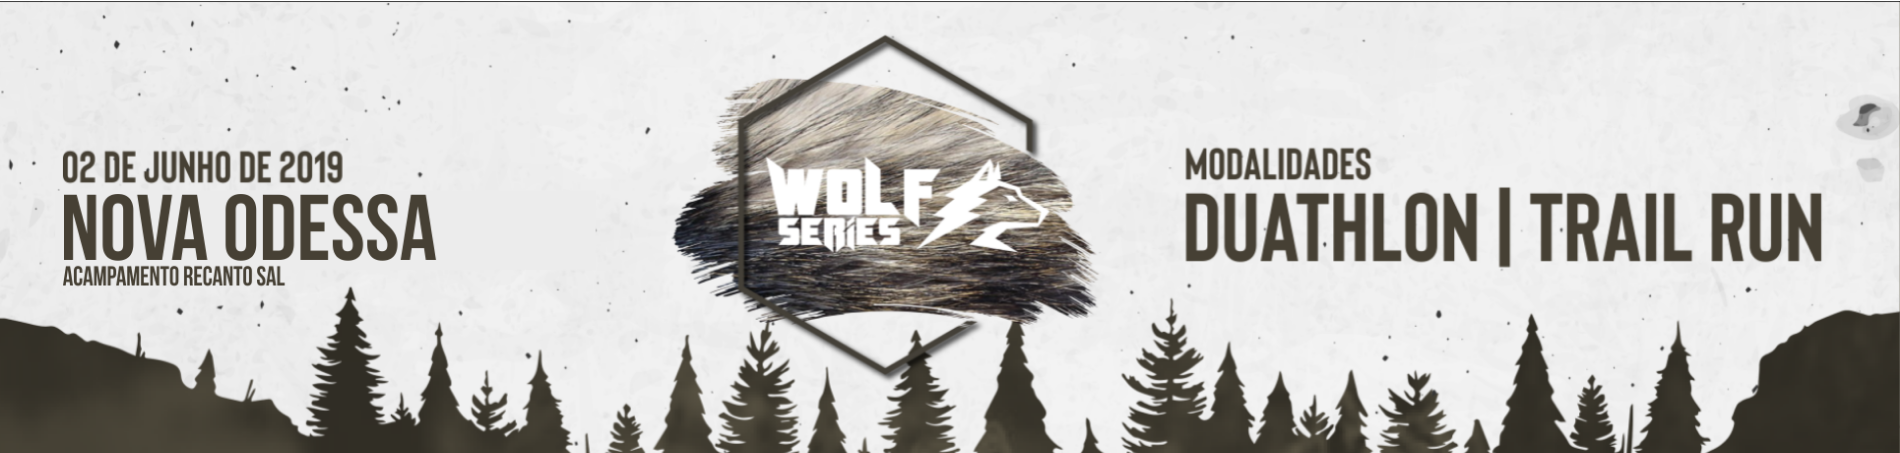 WOLF SERIES TRAIL RUN 2ª ETAPA - NOVA ODESSA